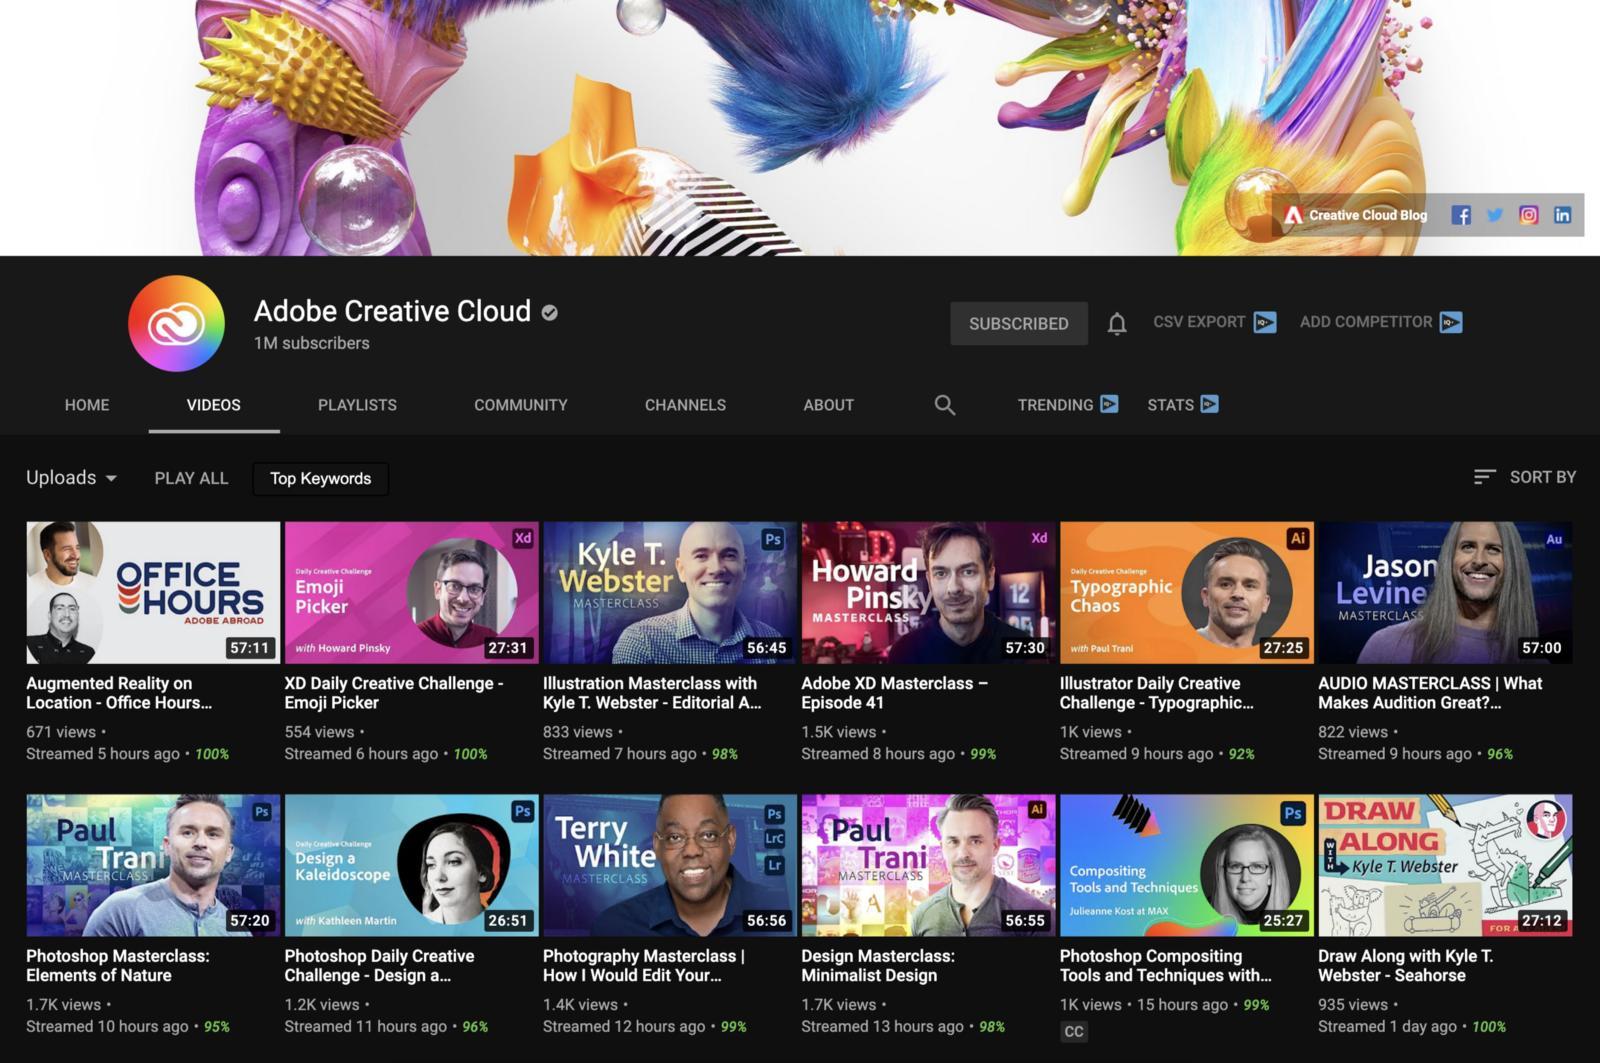 Adobe Creative Cloud YouTube channel